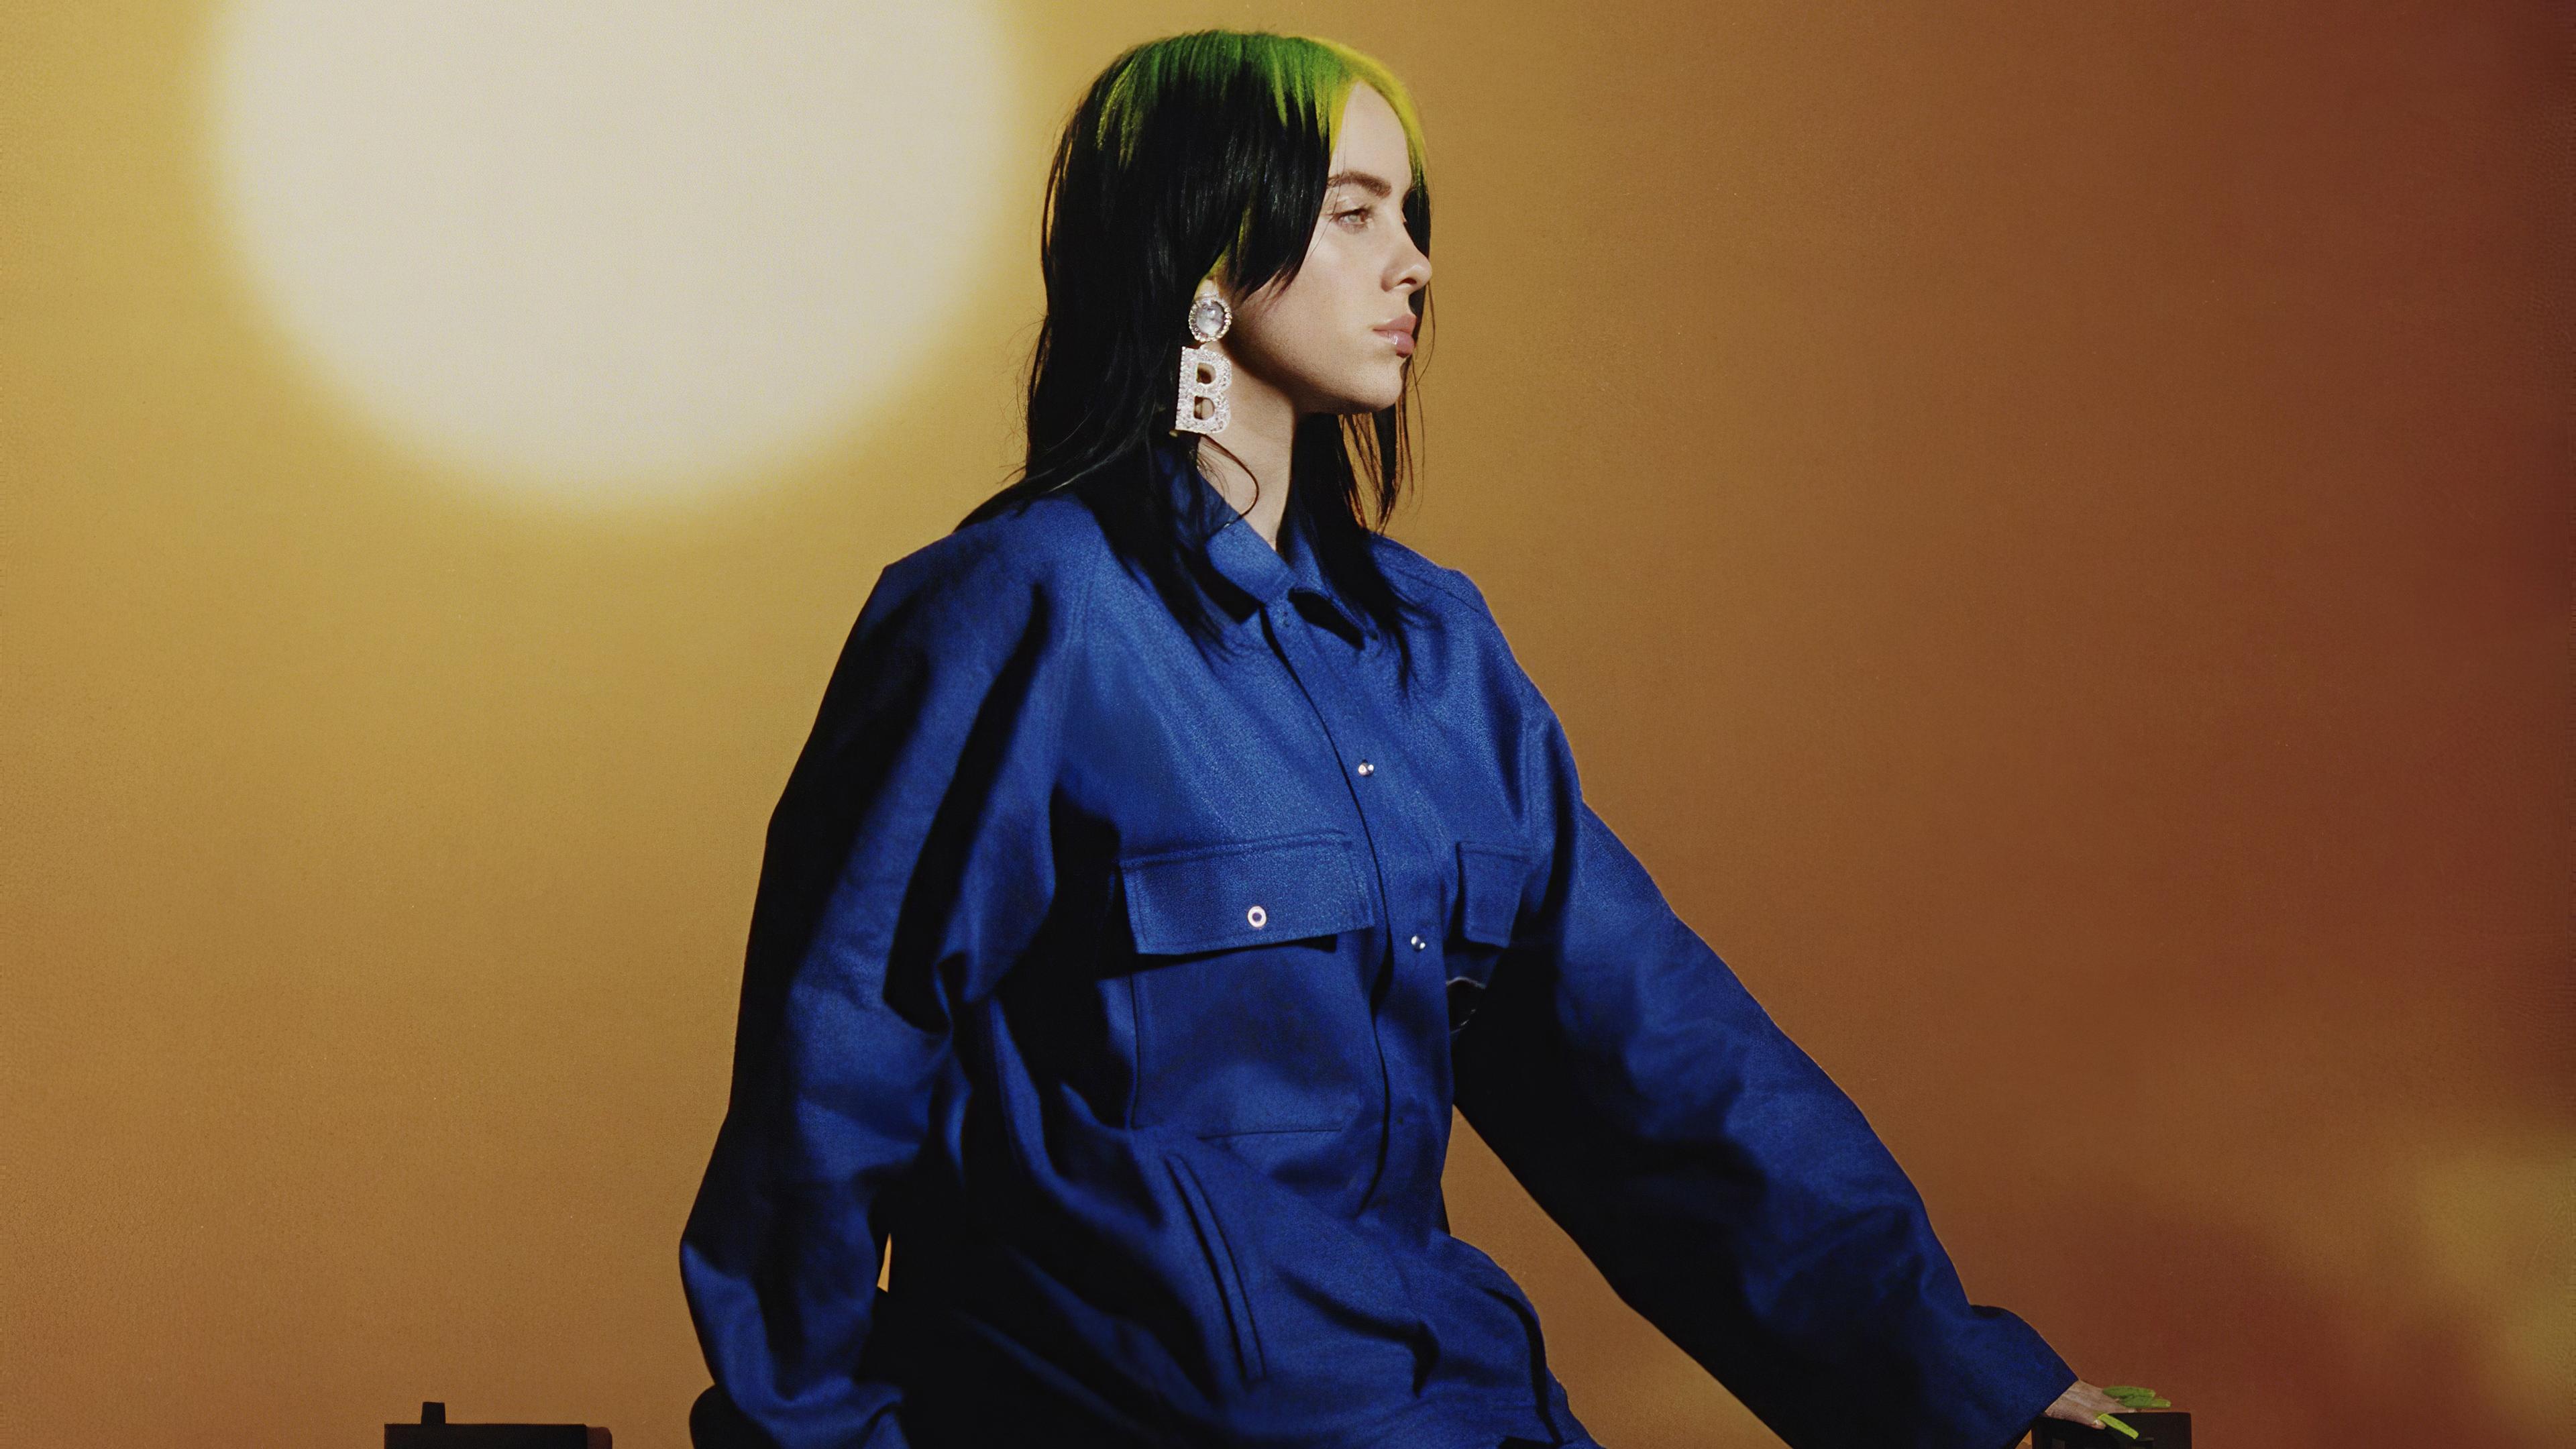 Billie Eilish Us Vogue March 2020 4k Hd Music 4k Wallpapers